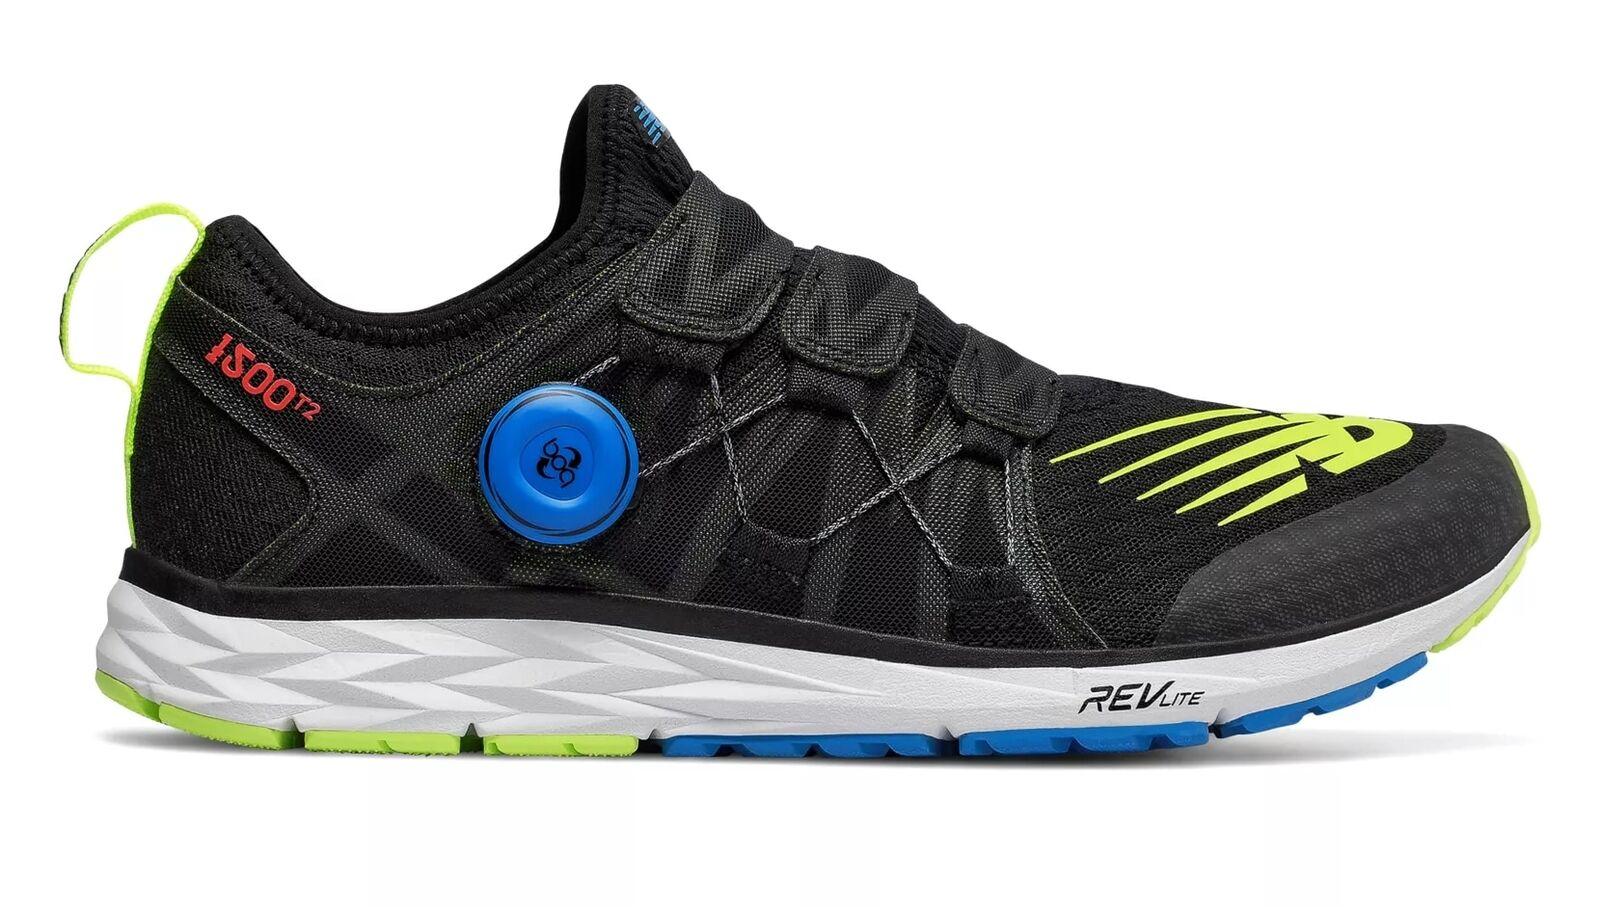 New Balance 1500T2 Scarpa da Corsa Running men Palestra Black with Hi-Lite bluee